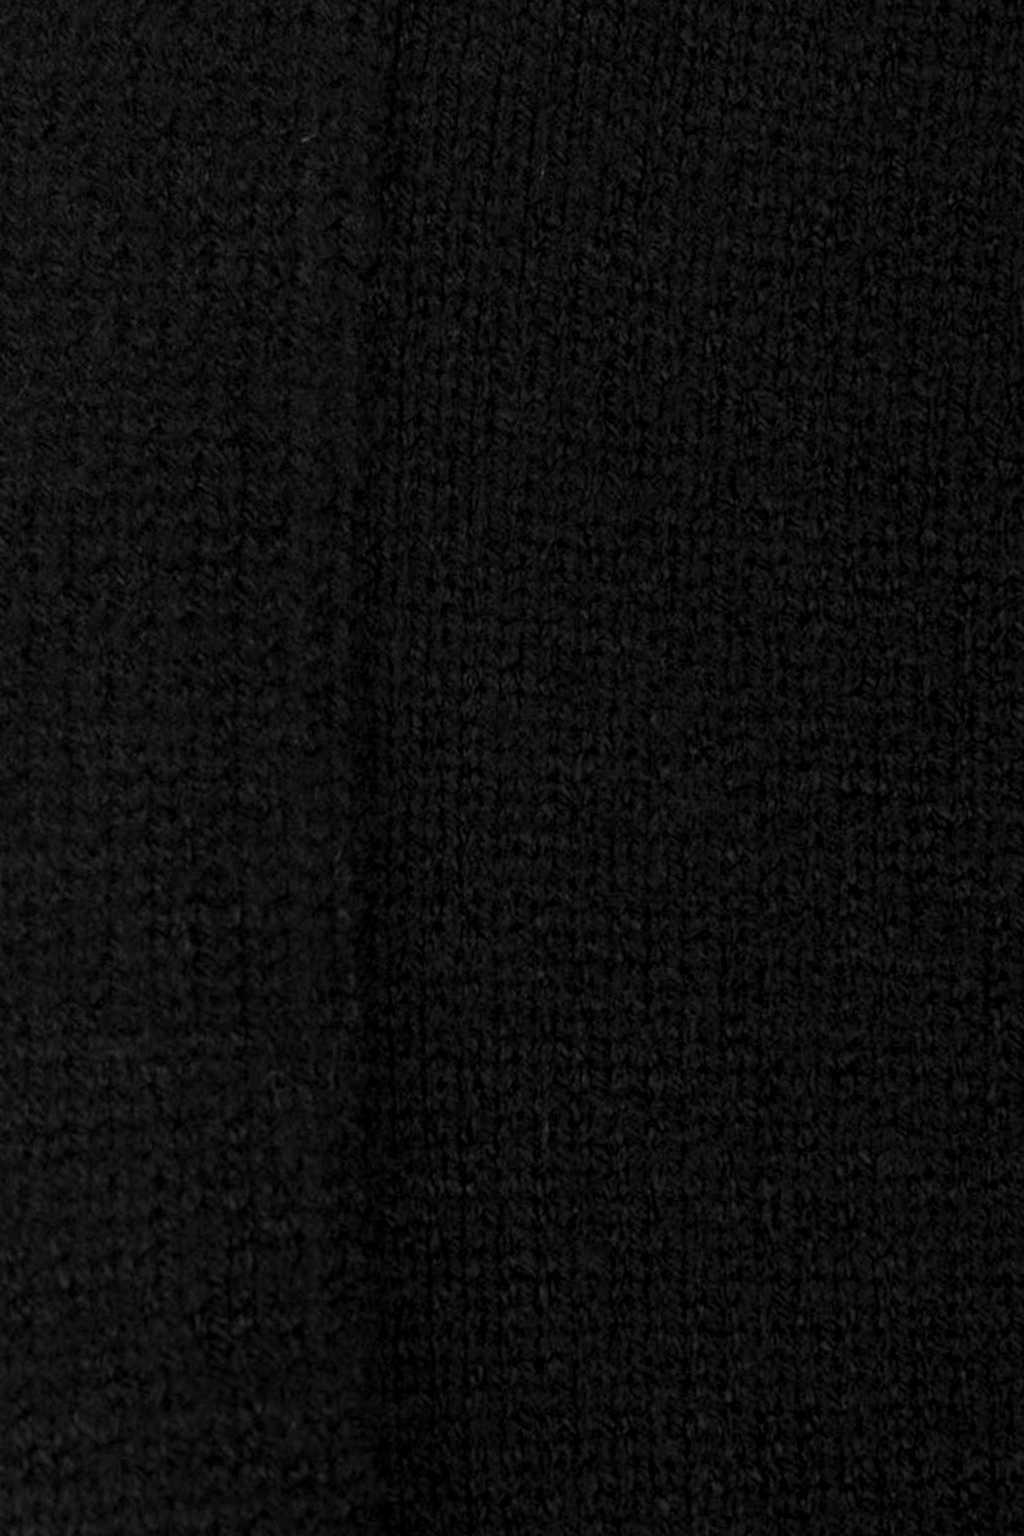 Cardigan 1551 Black 8